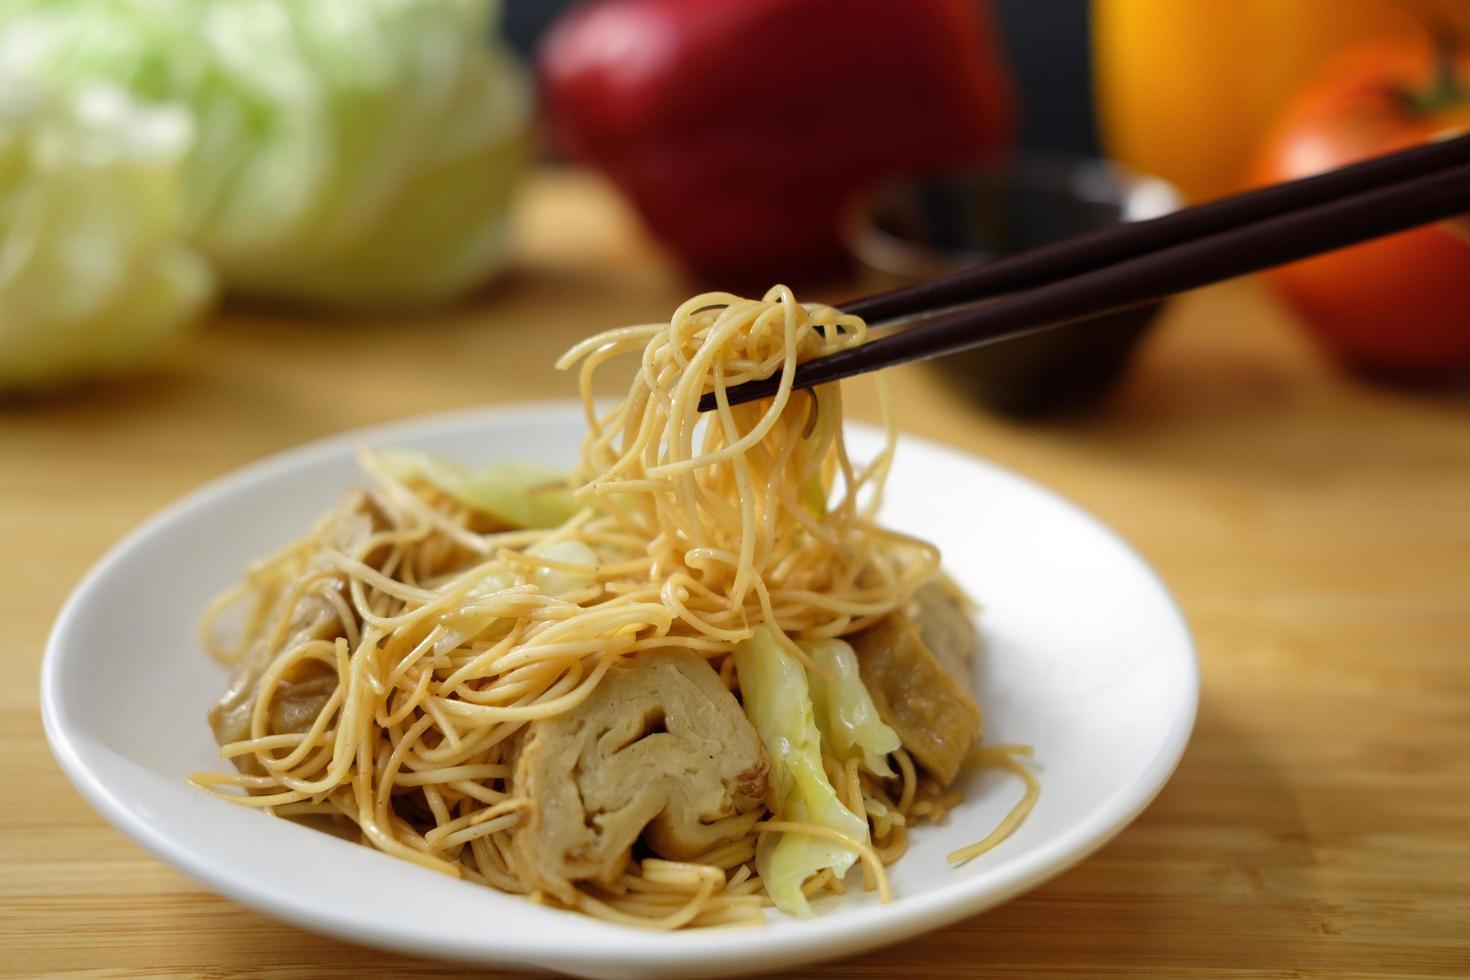 Chopsticks holding noodles on plate photo